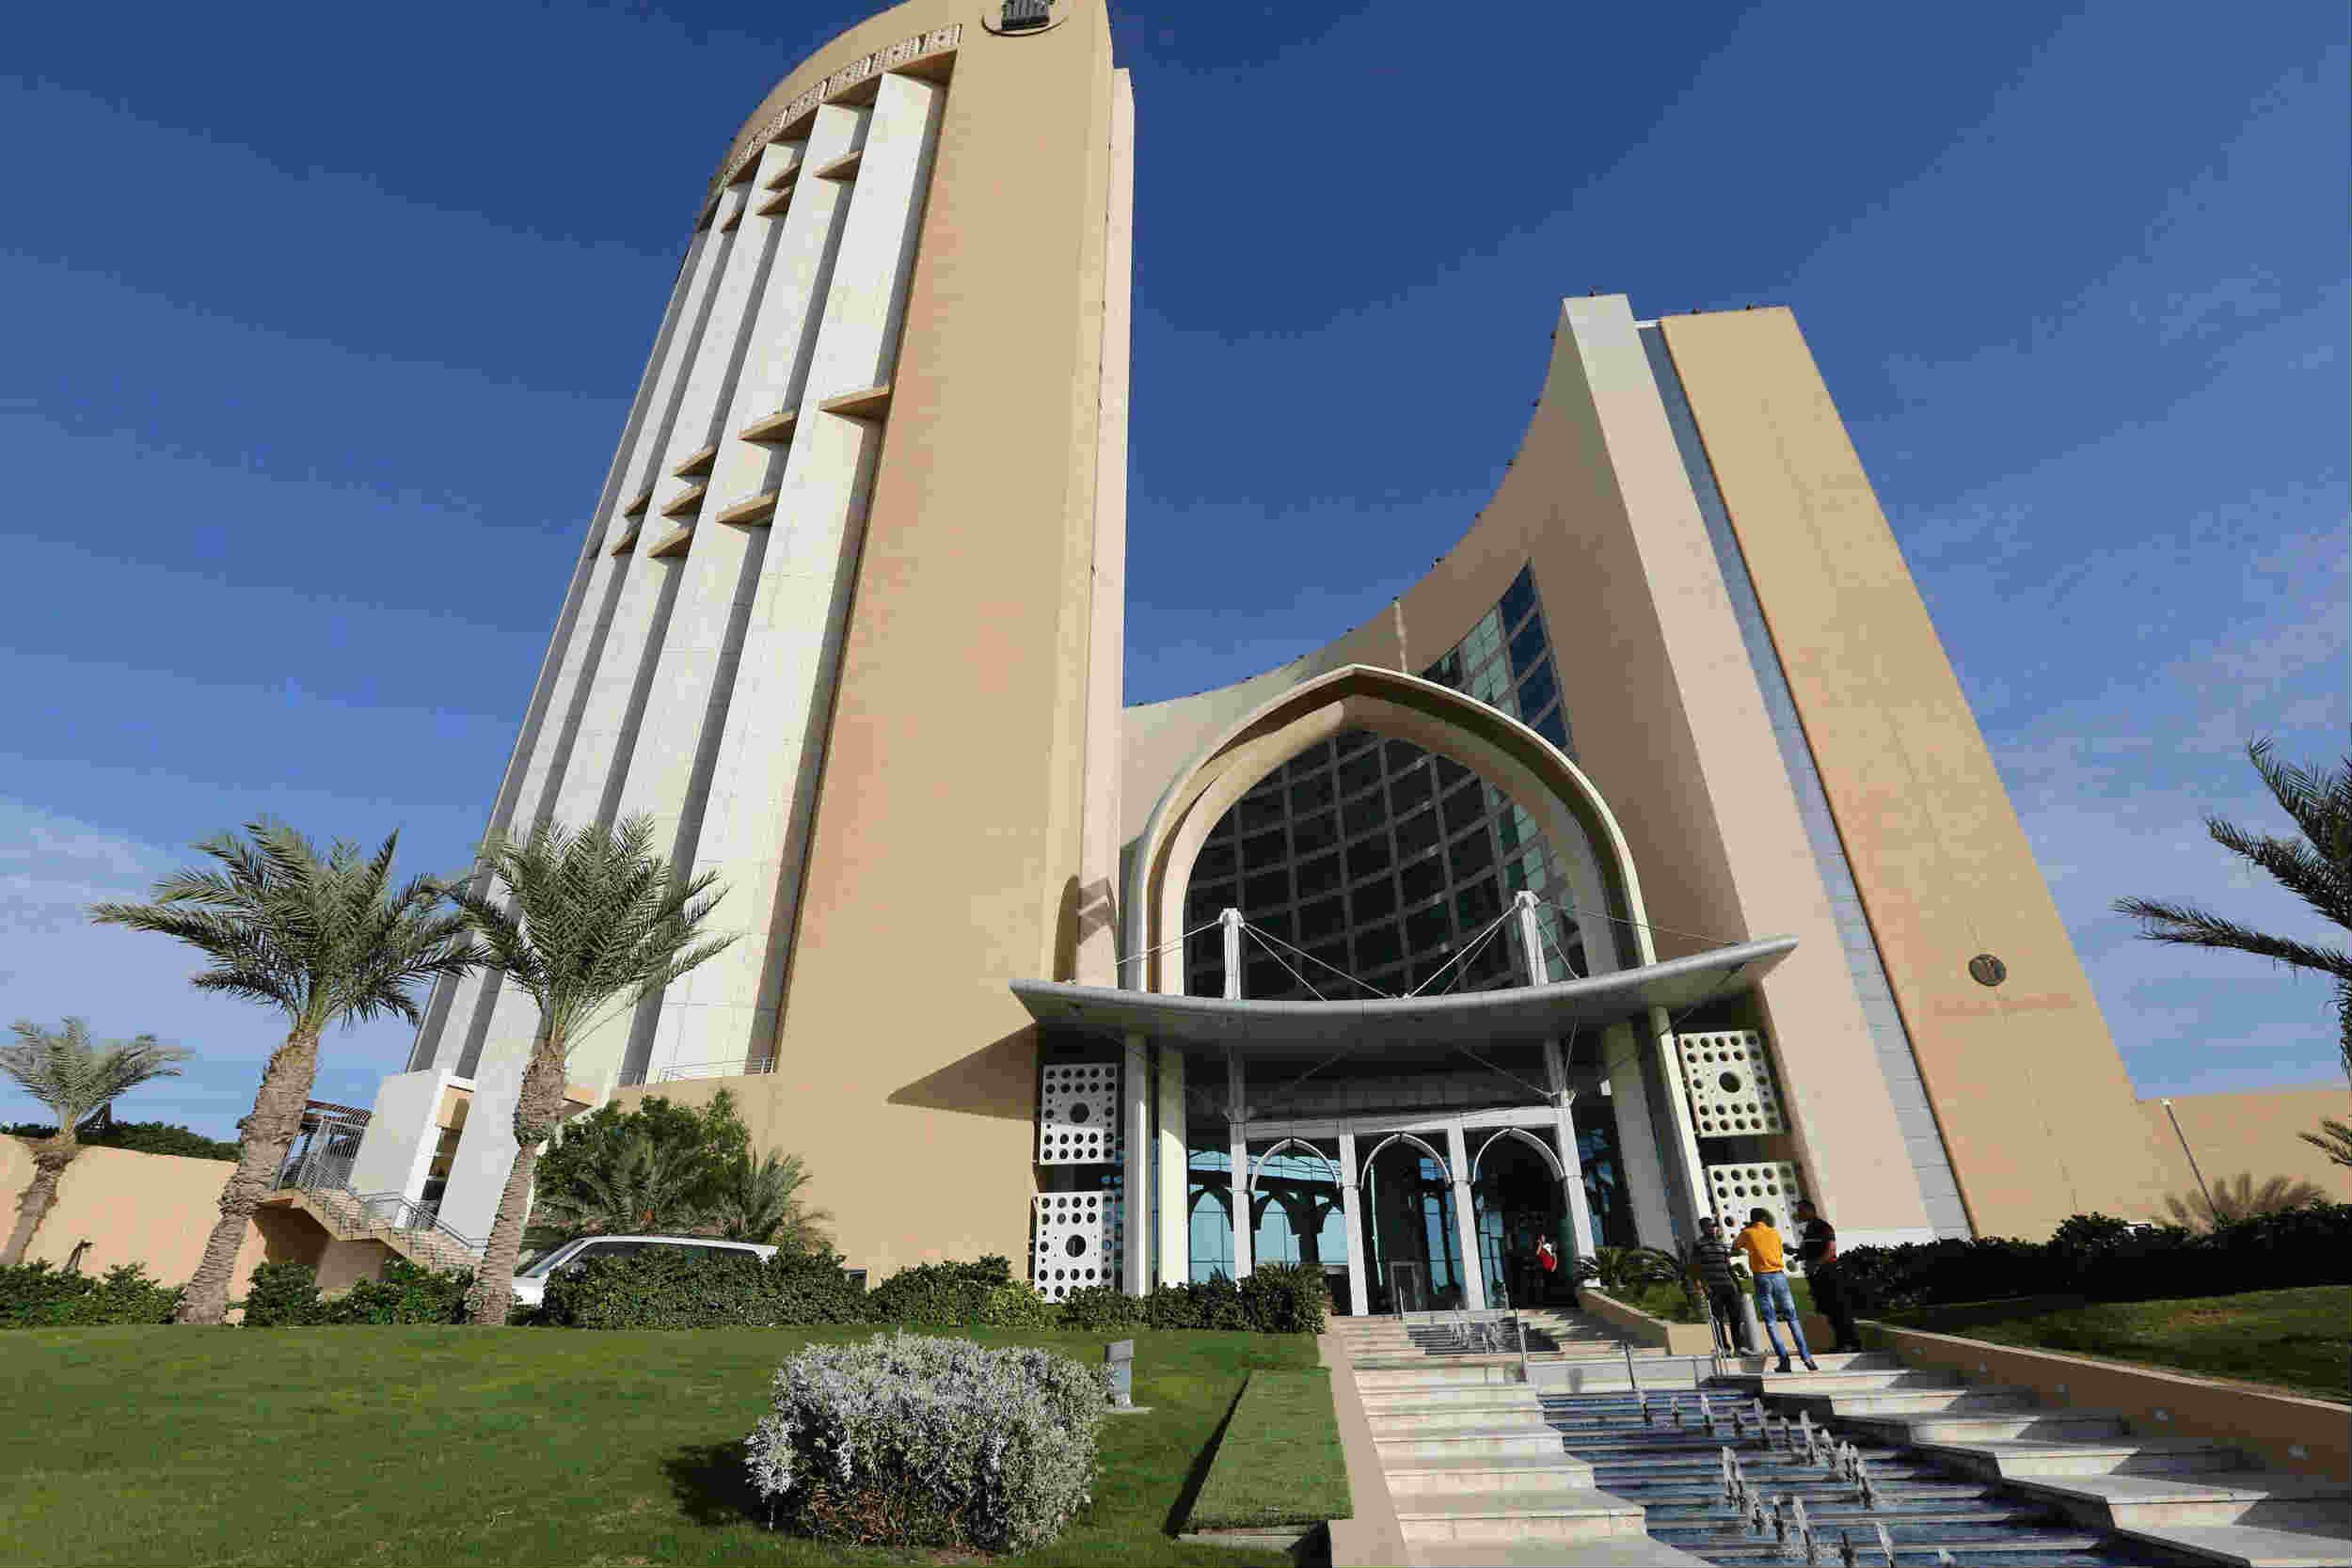 Militants horrified Libya by assaulting Corinthia Hotel in Tripoli